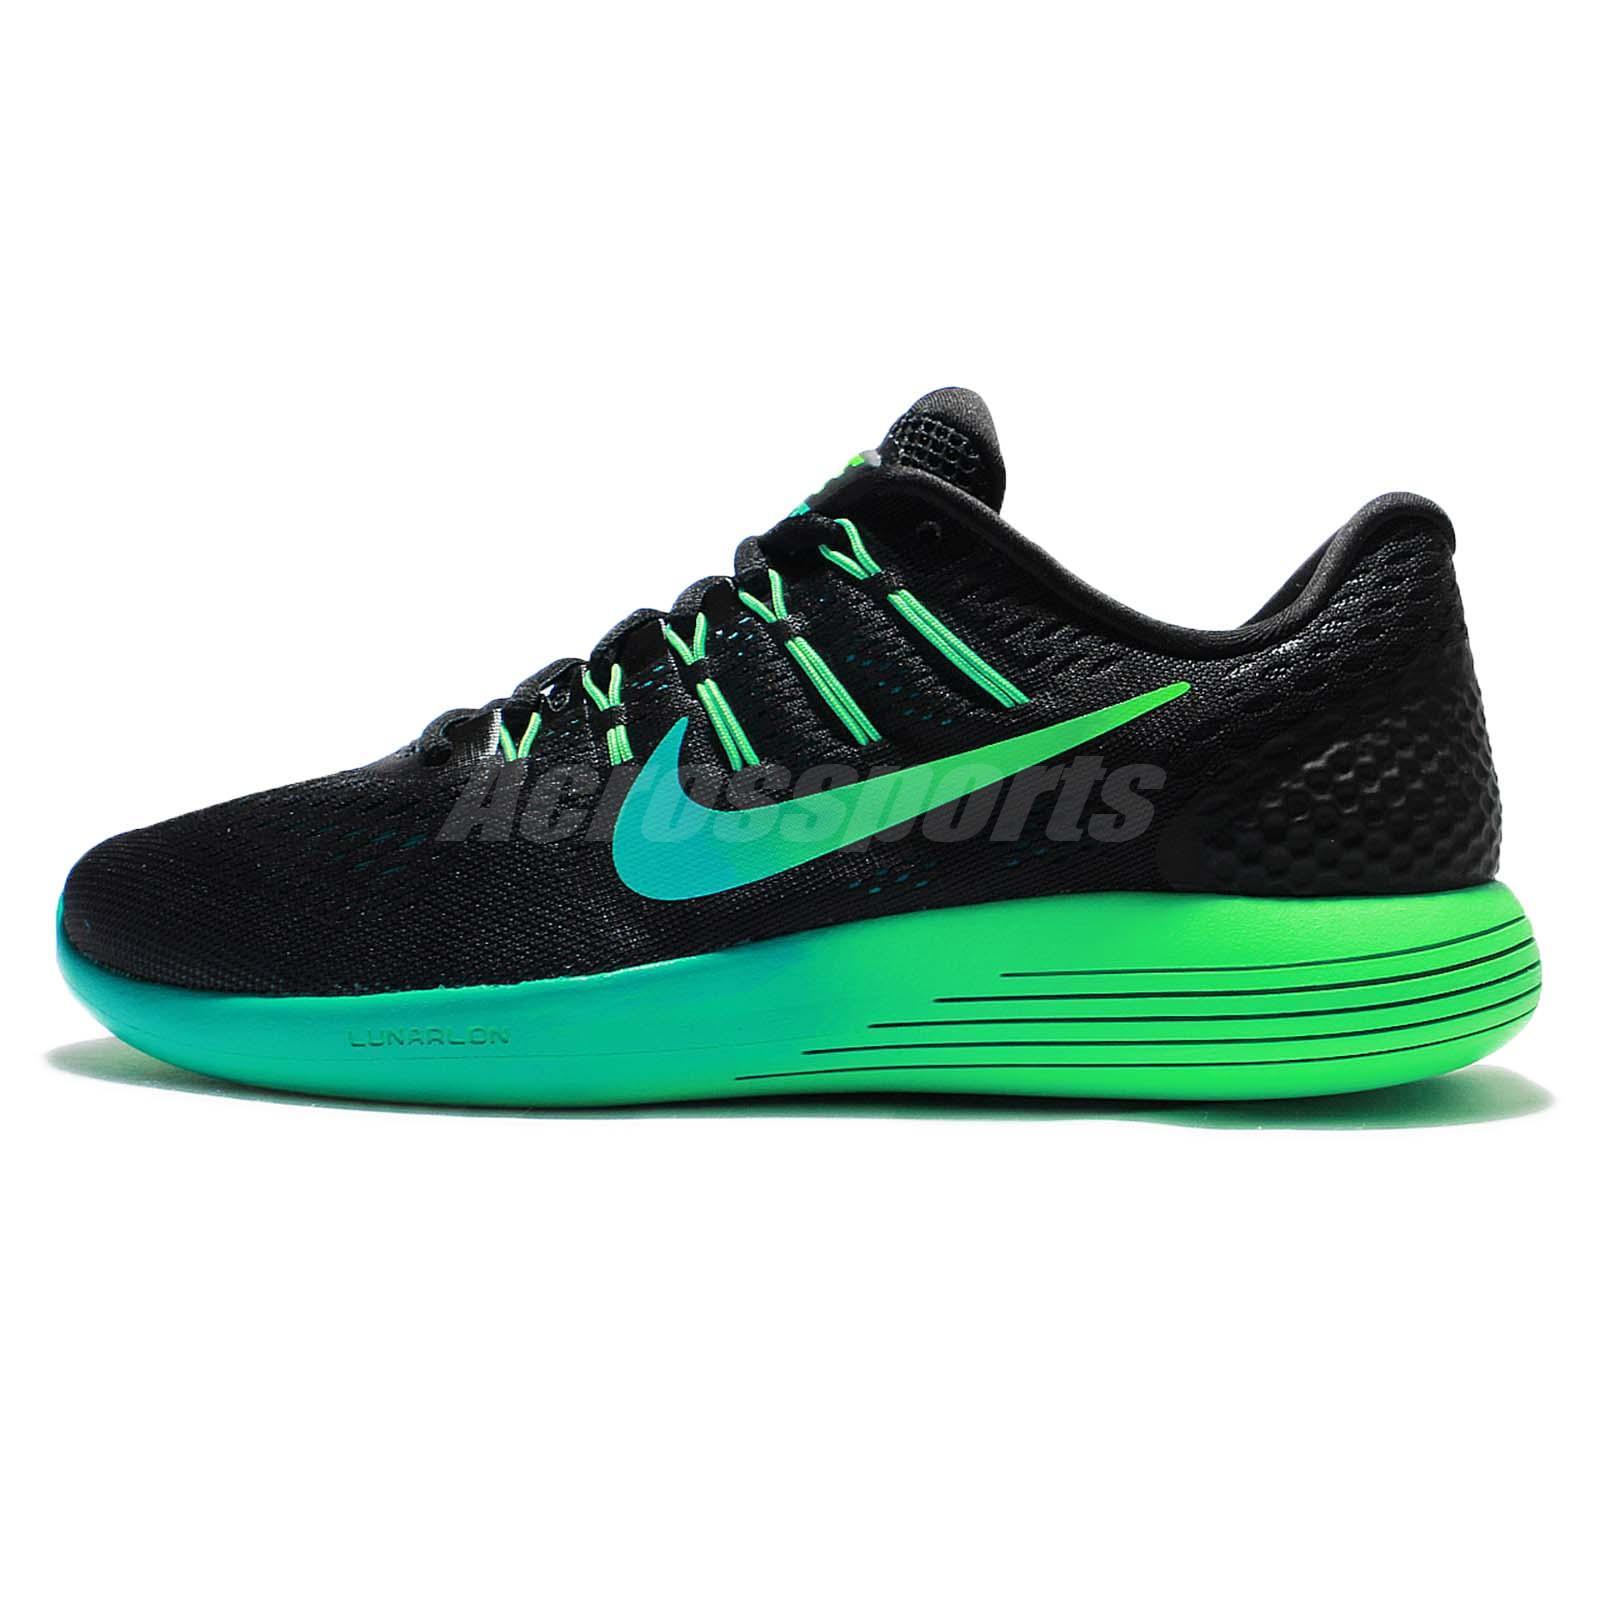 pretty nice 5921f 4e2cf ... ireland nike lunarglide 8 viii black green mens running shoes sneakers  843725 003 c9abe 24110